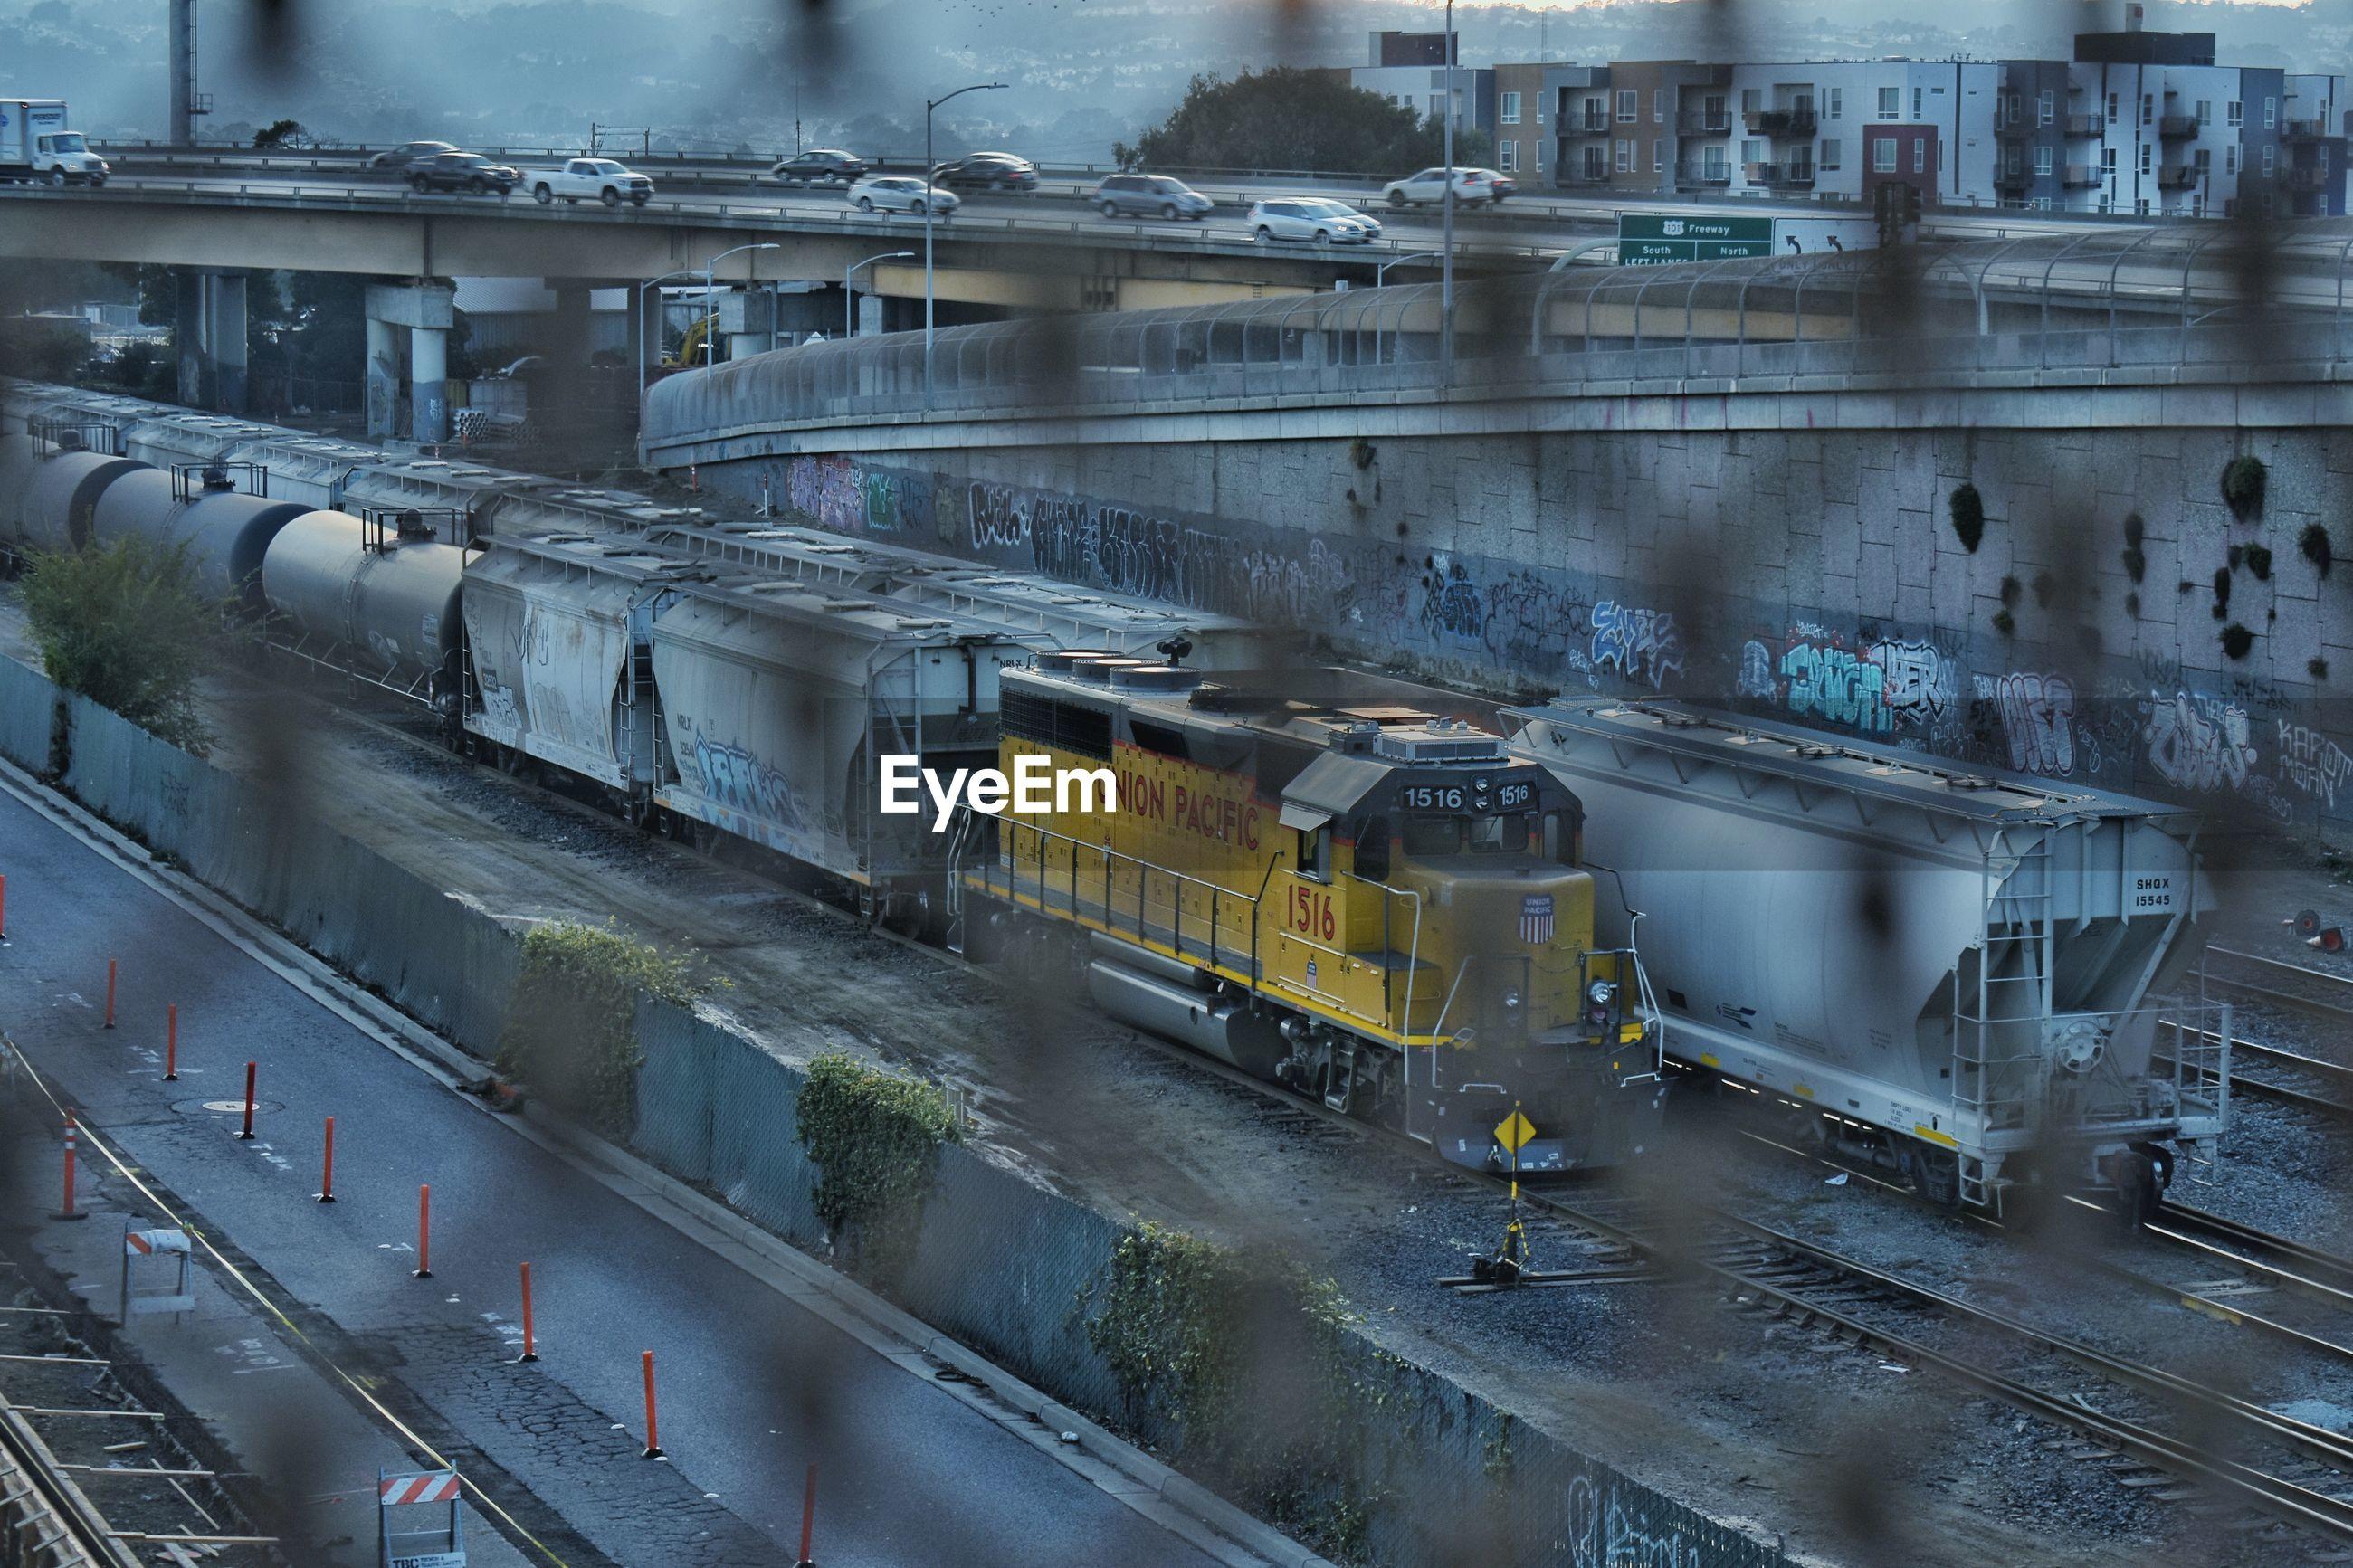 High angle view of train on railroad tracks seen through window